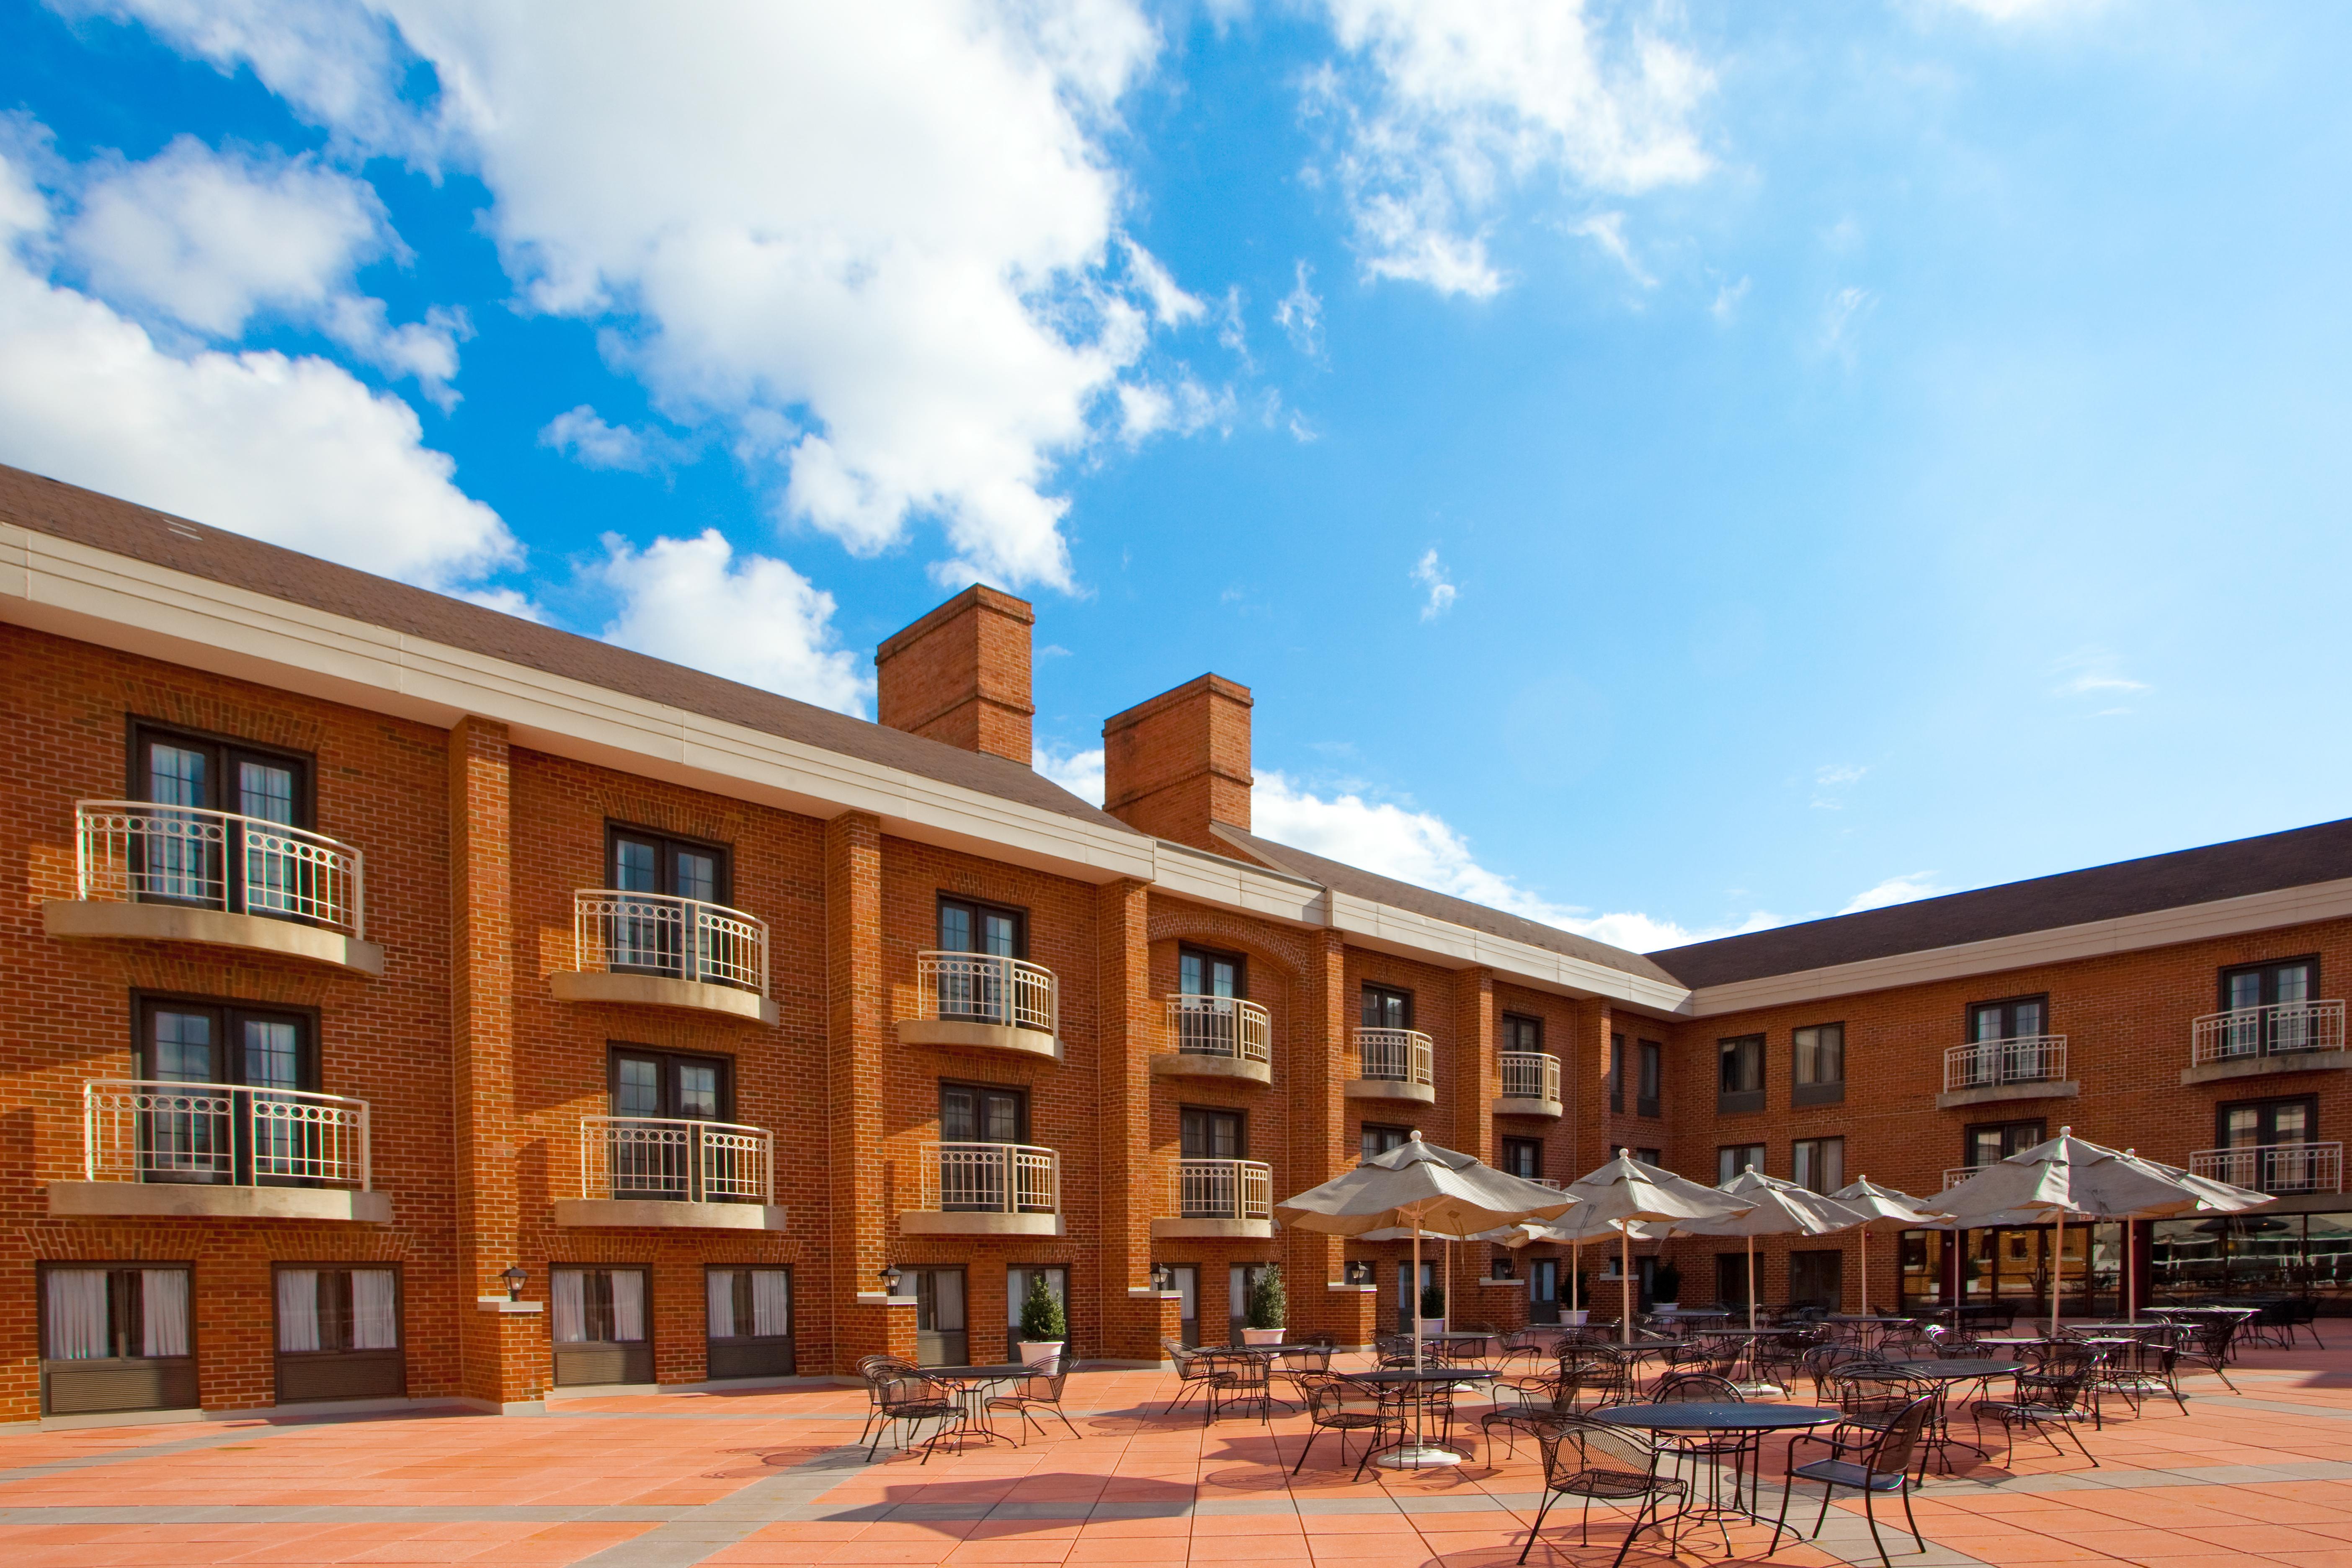 Hotel Marinii Holiday Inn By Ihg Hospitality Net